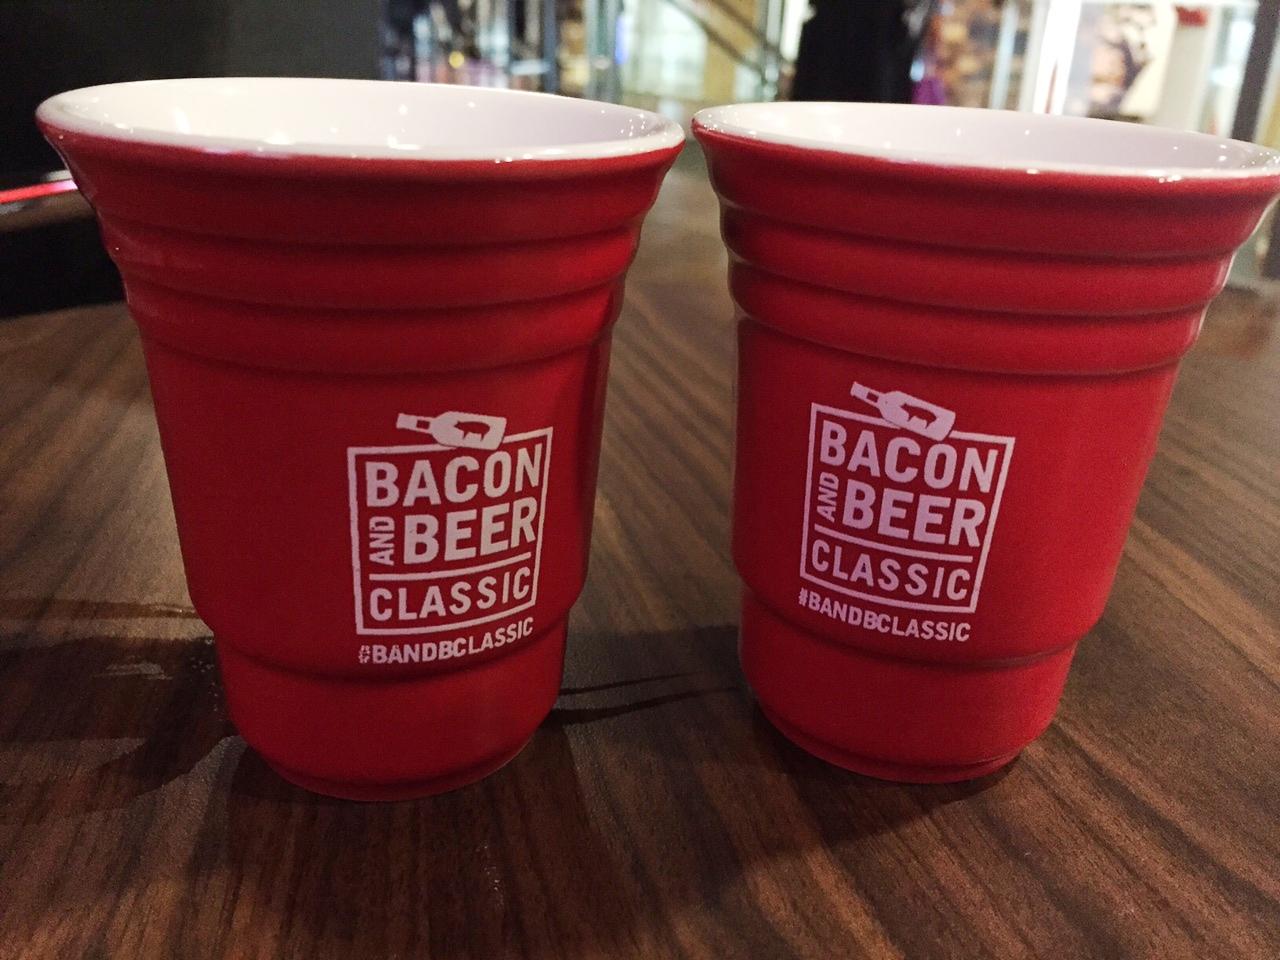 The tasting glasses were mini Solo cups—but ceramic, not plastic